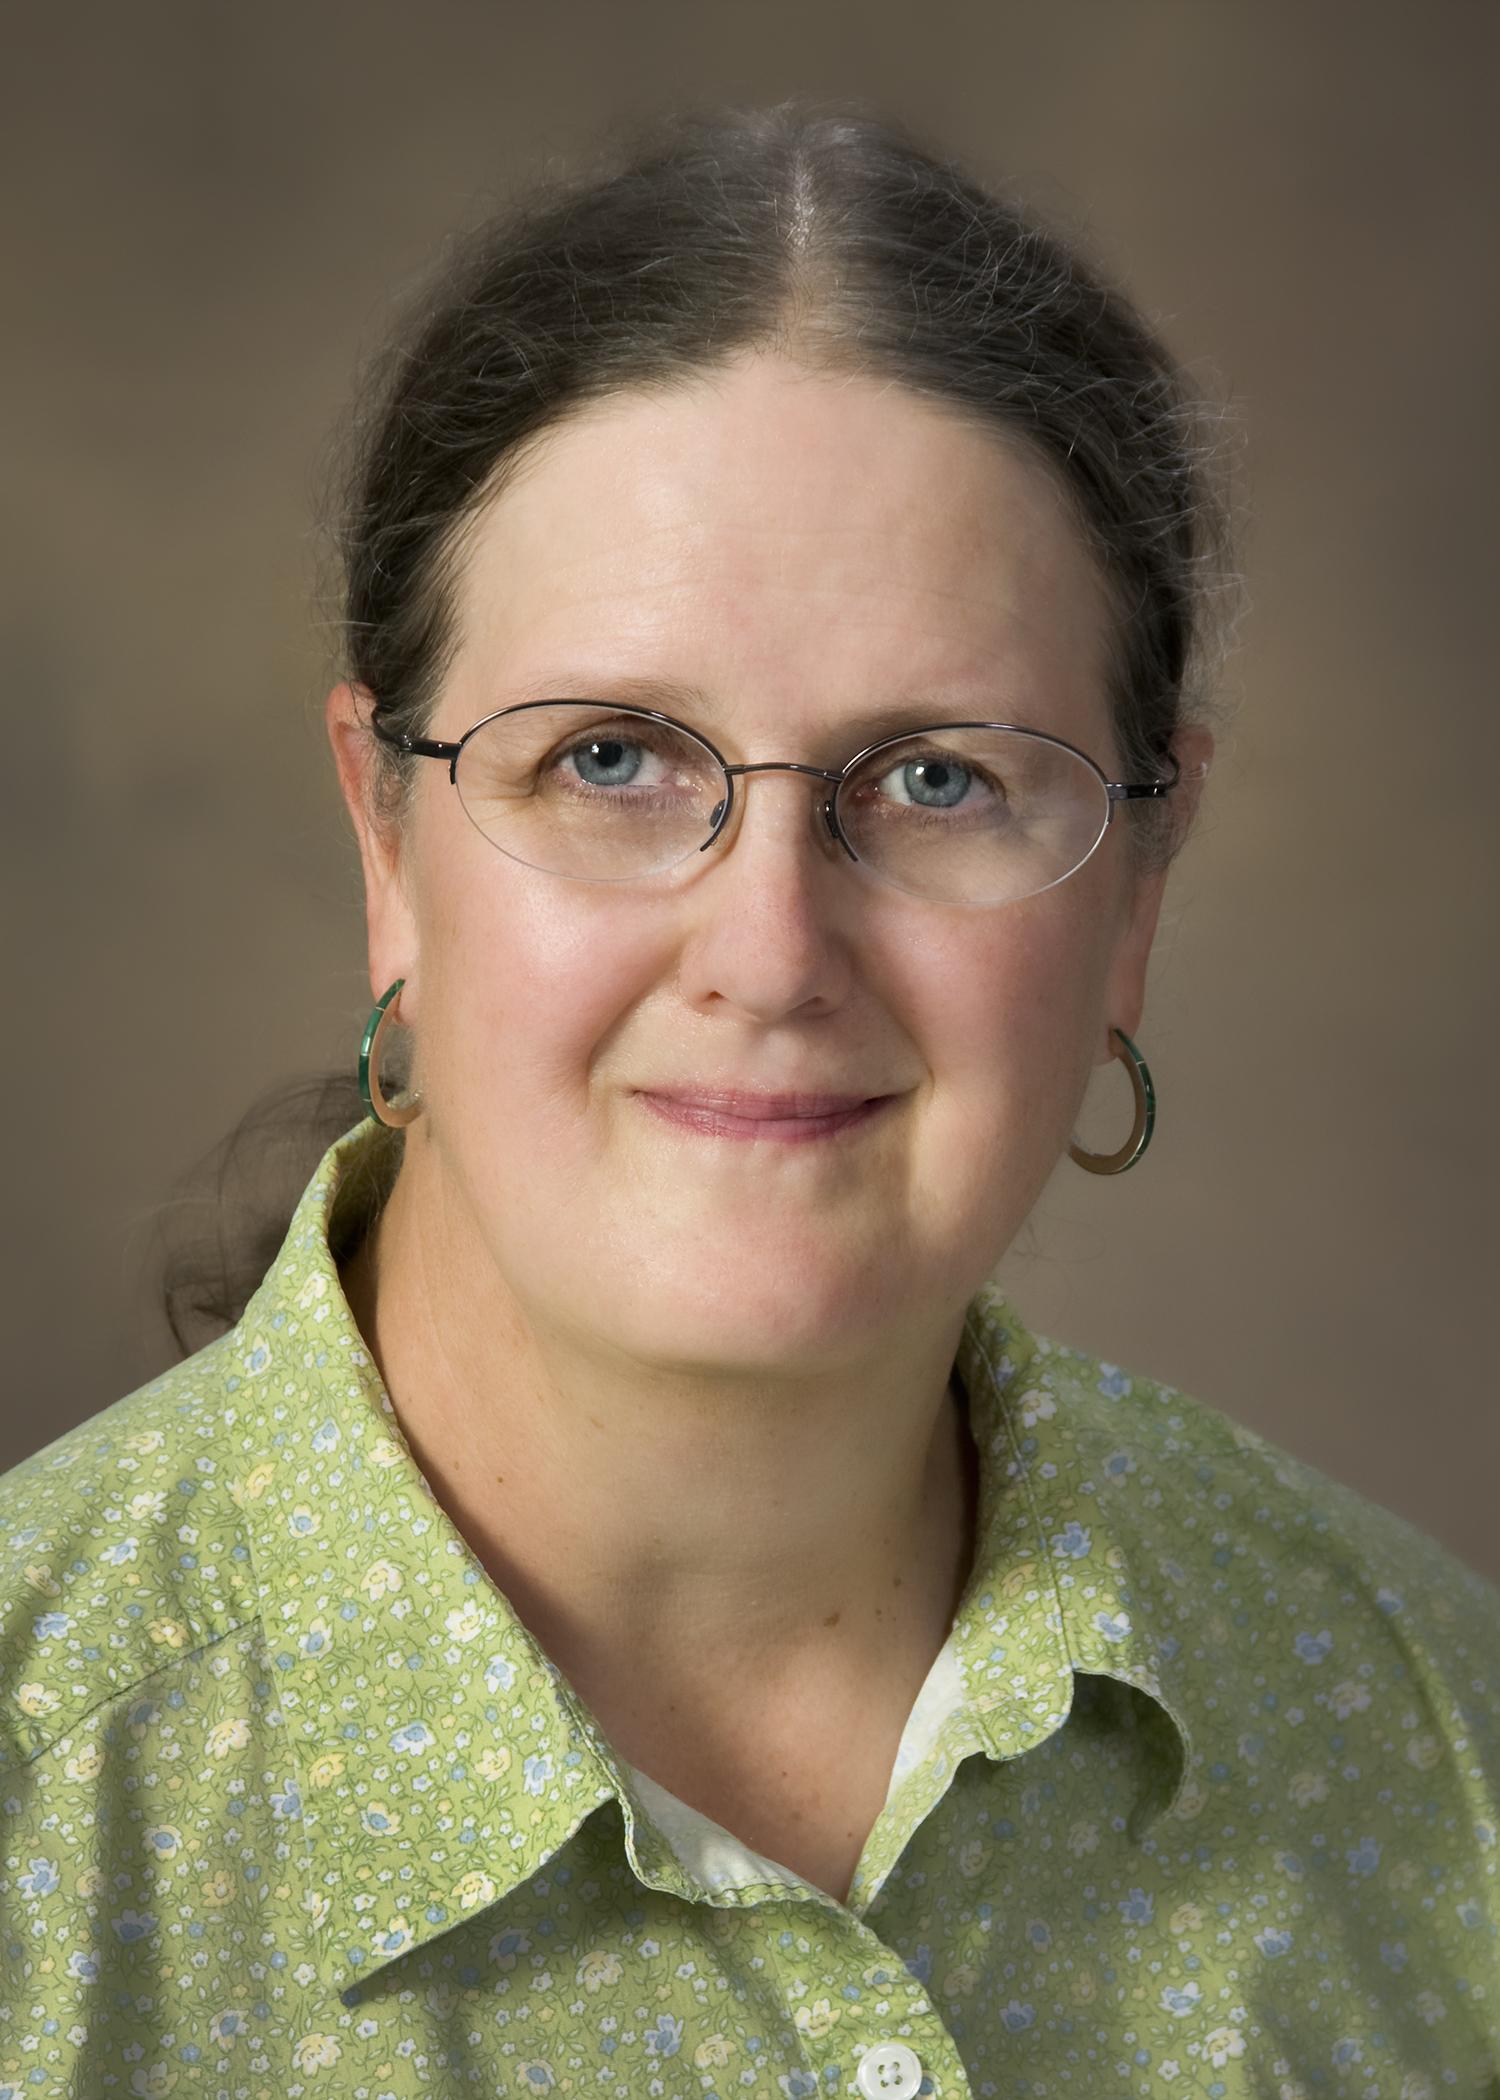 image of Marcia Rieke